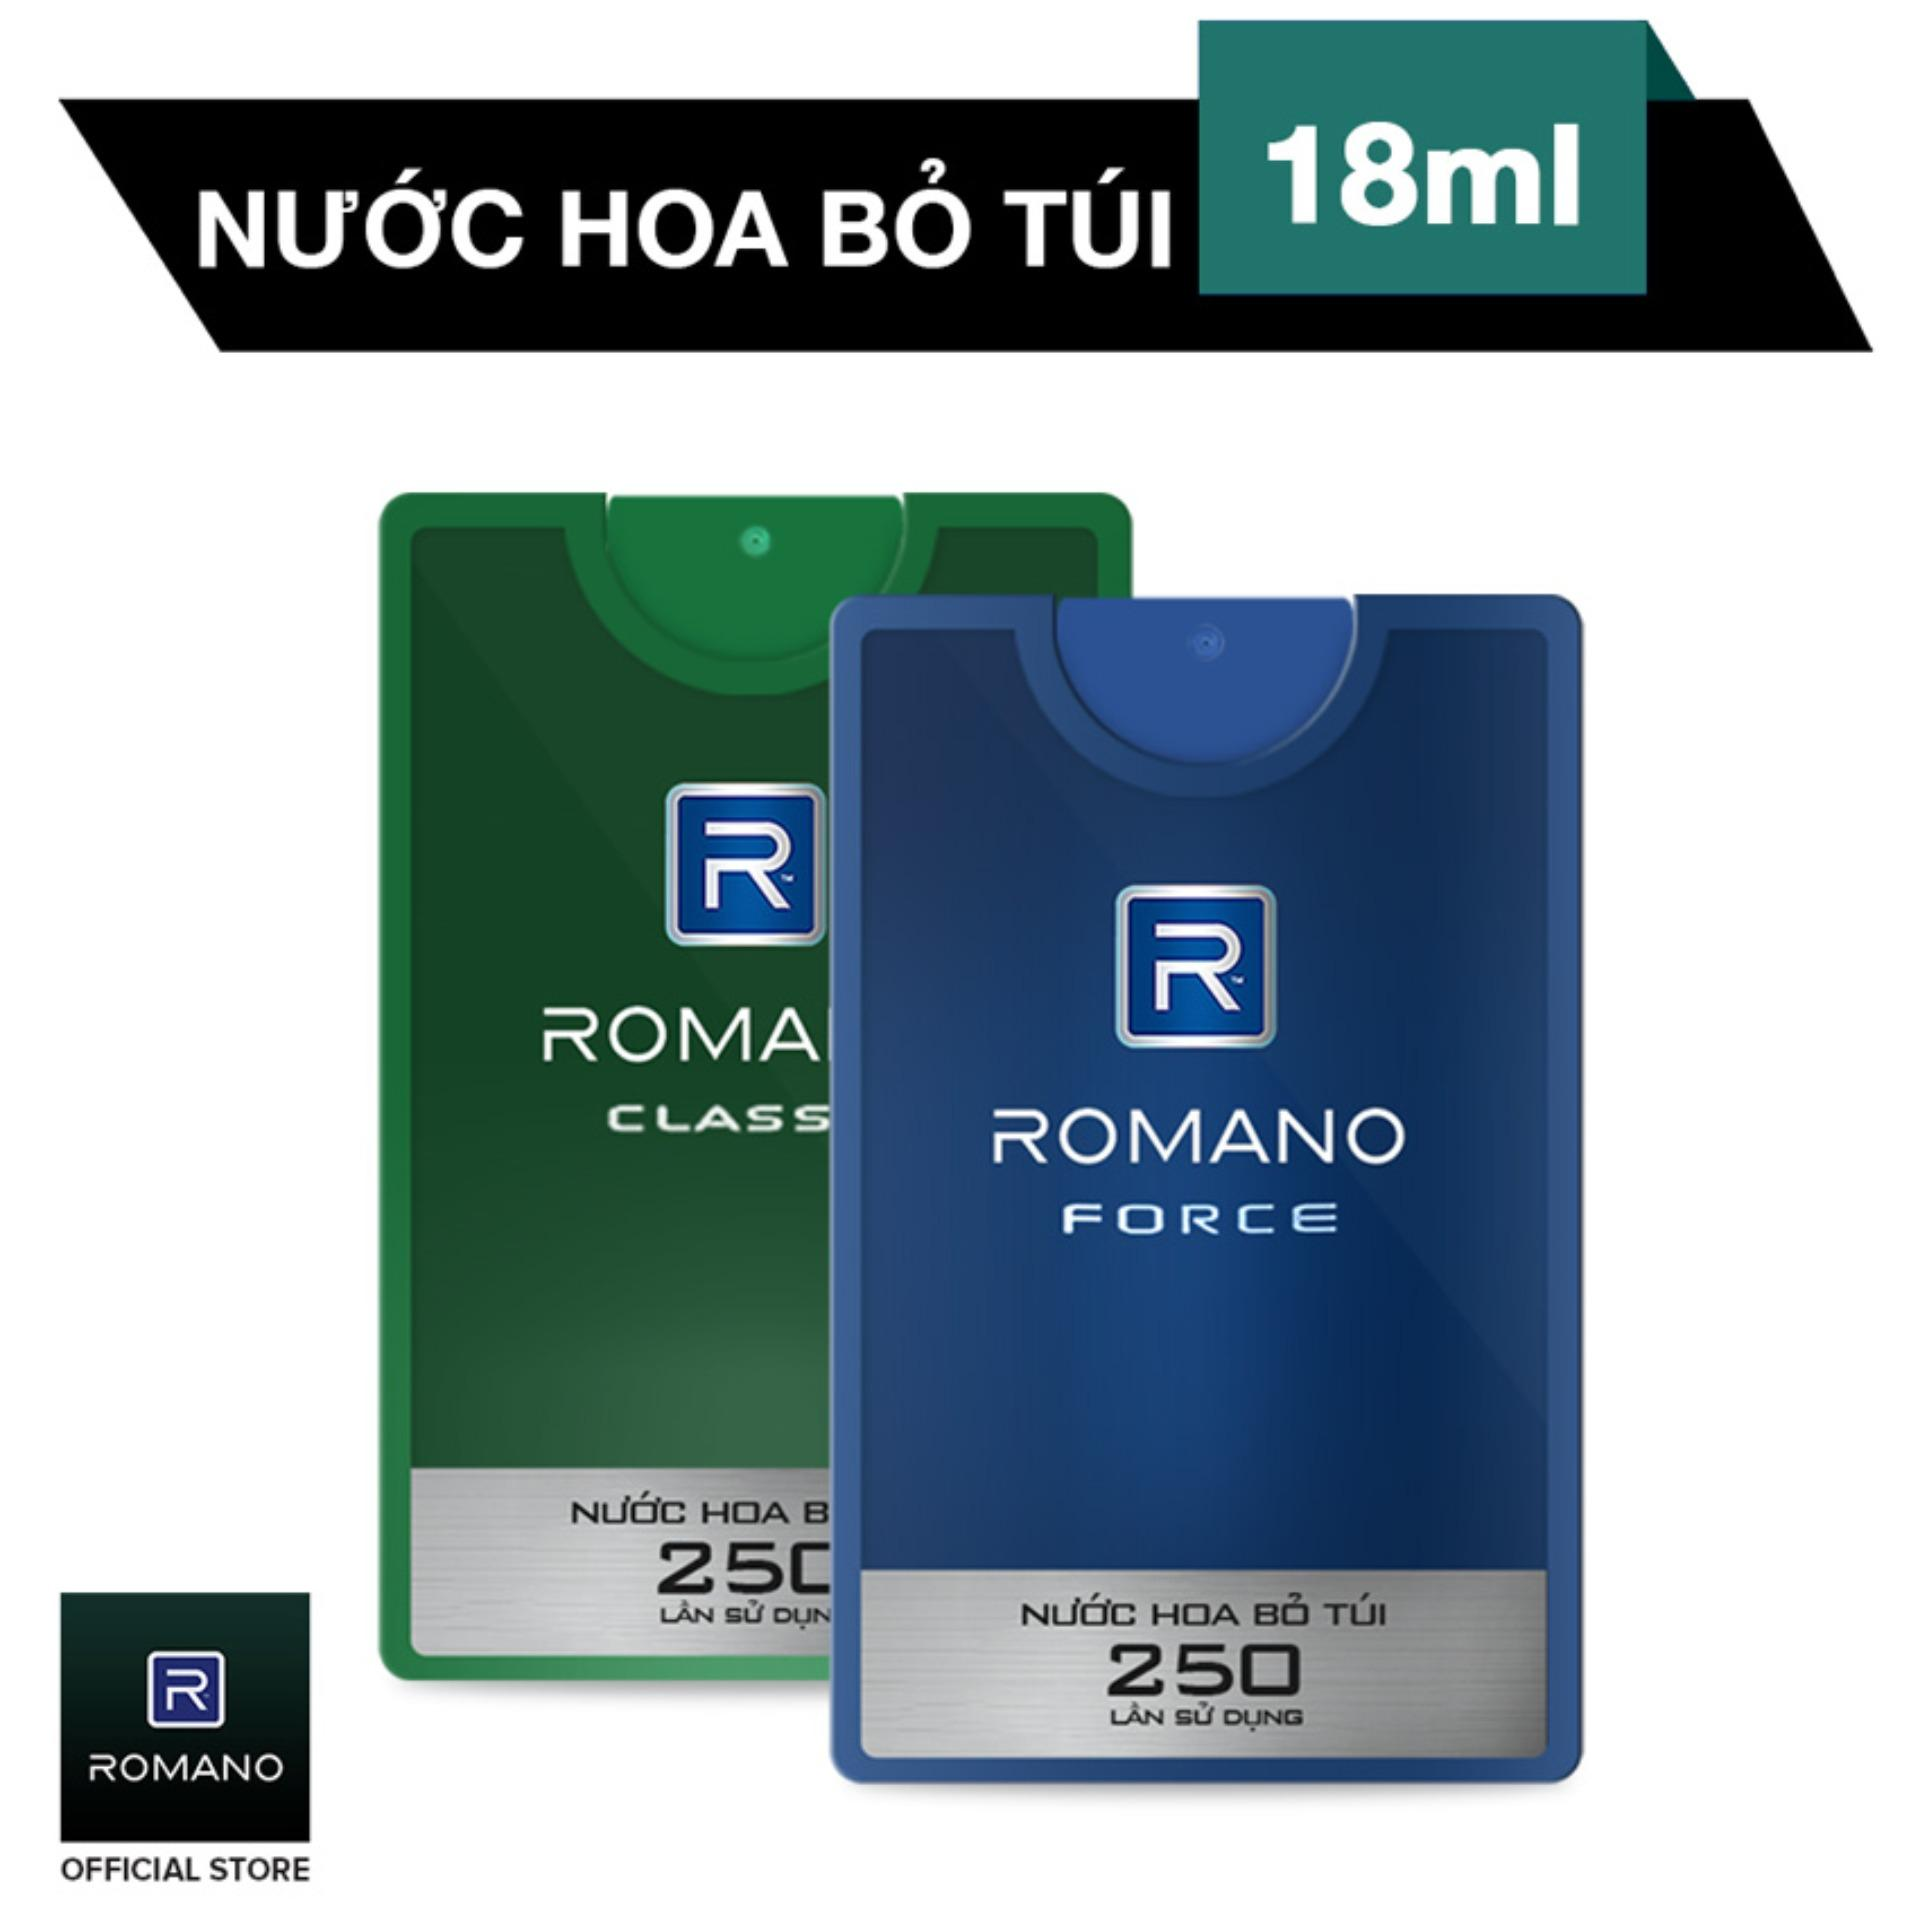 Romano - Combo 02 Nước hoa bỏ túi 18ml (Classic + Force)